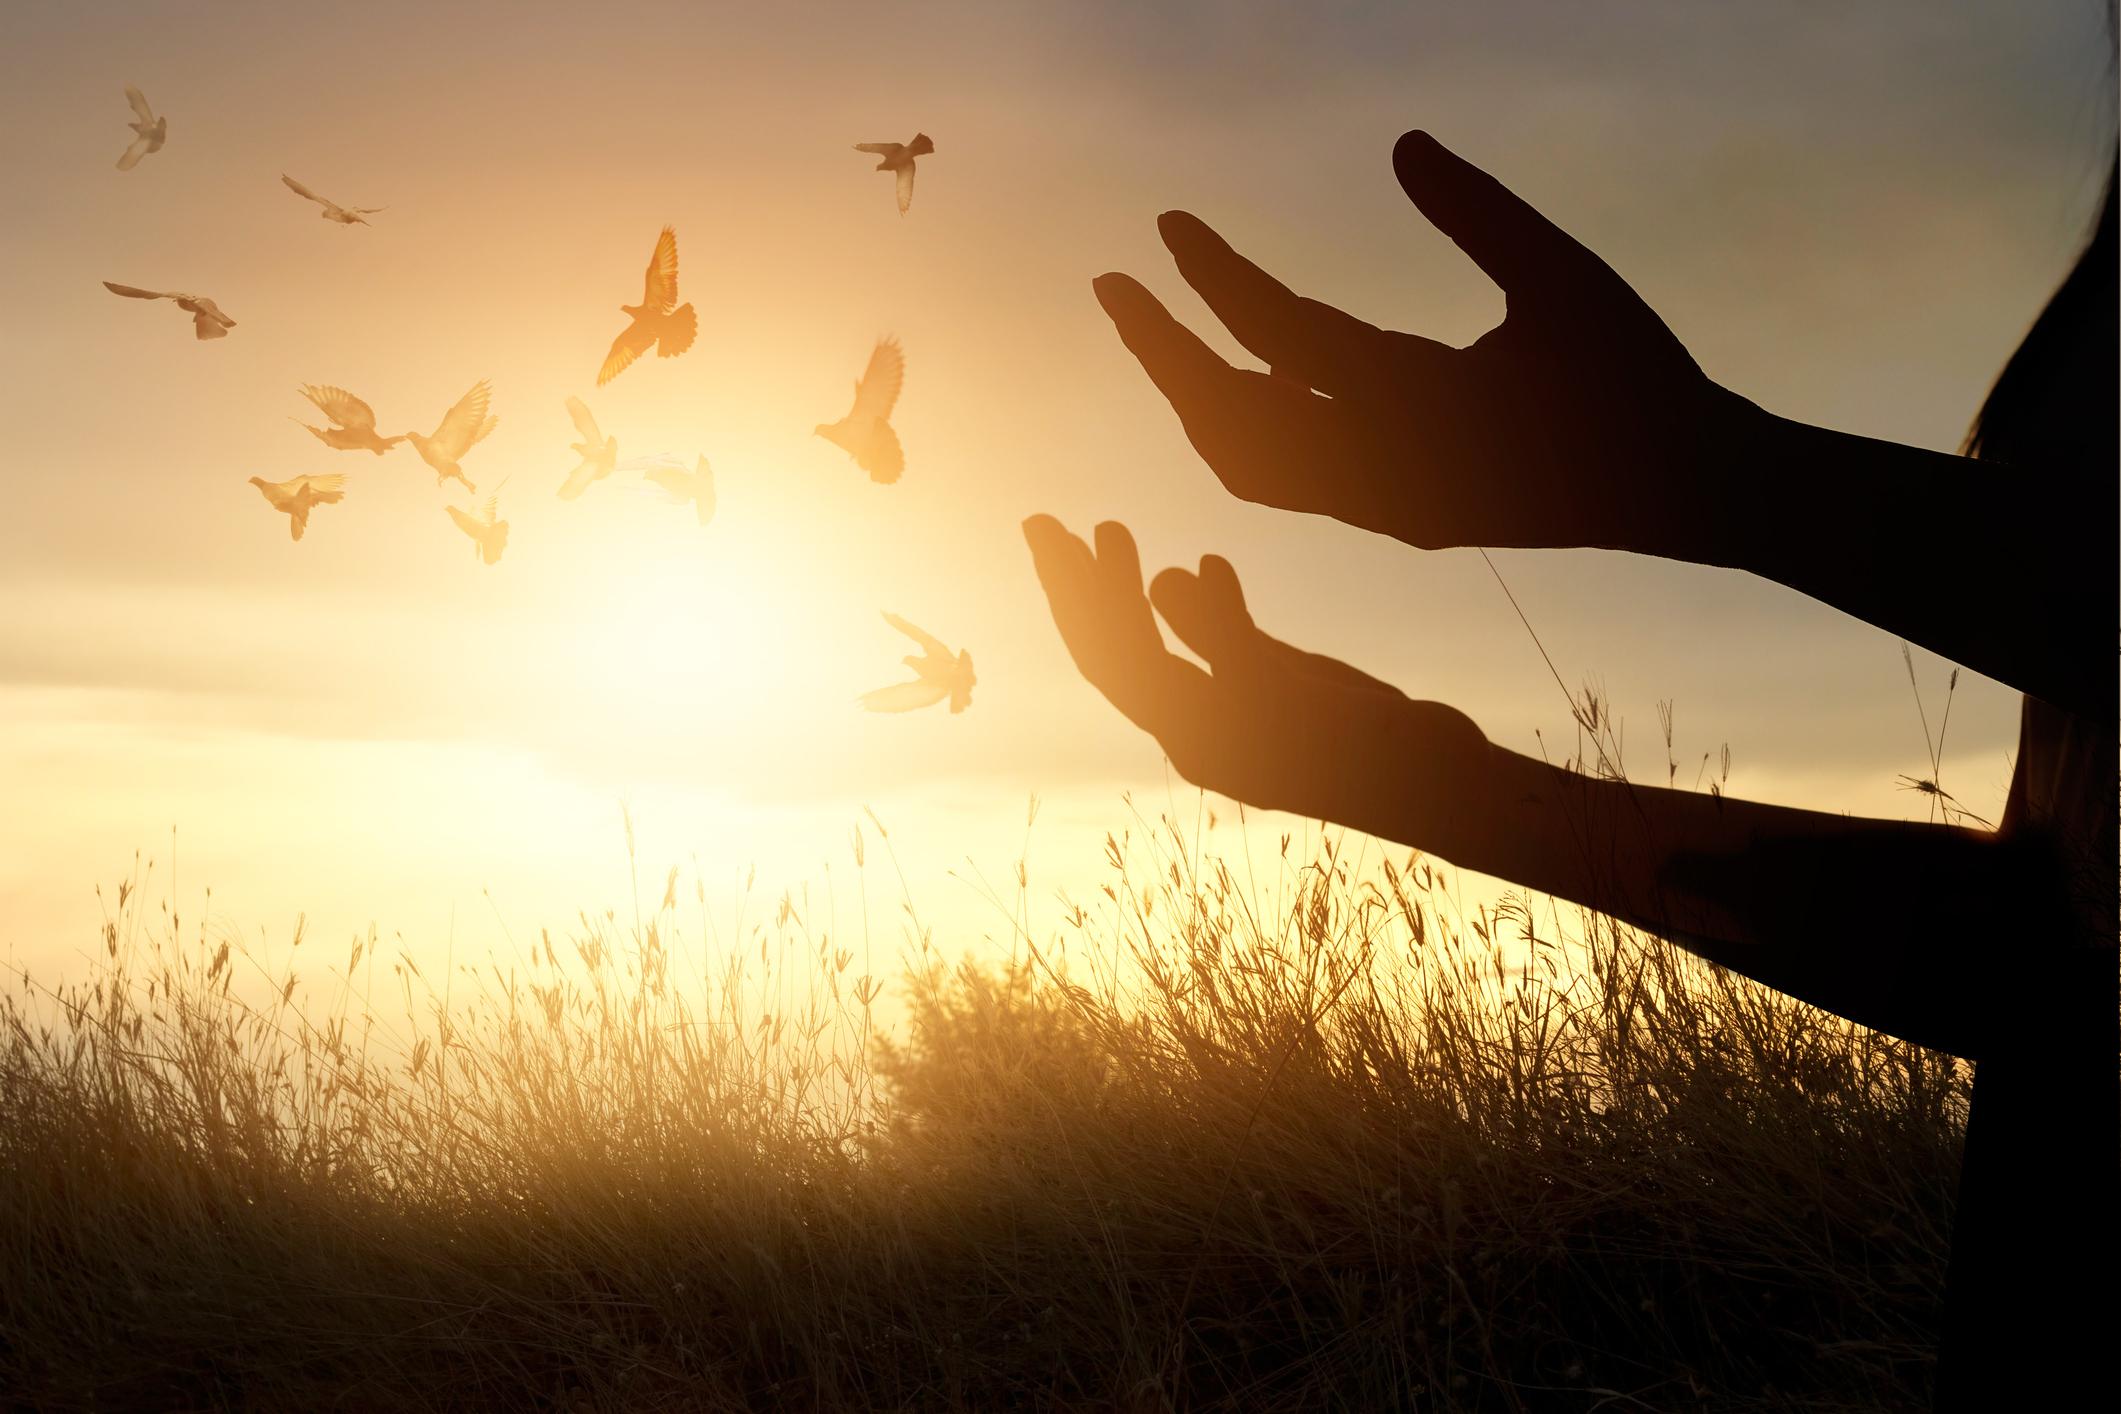 Prayers Work If You Believe God Listens, Regardless Of The Words